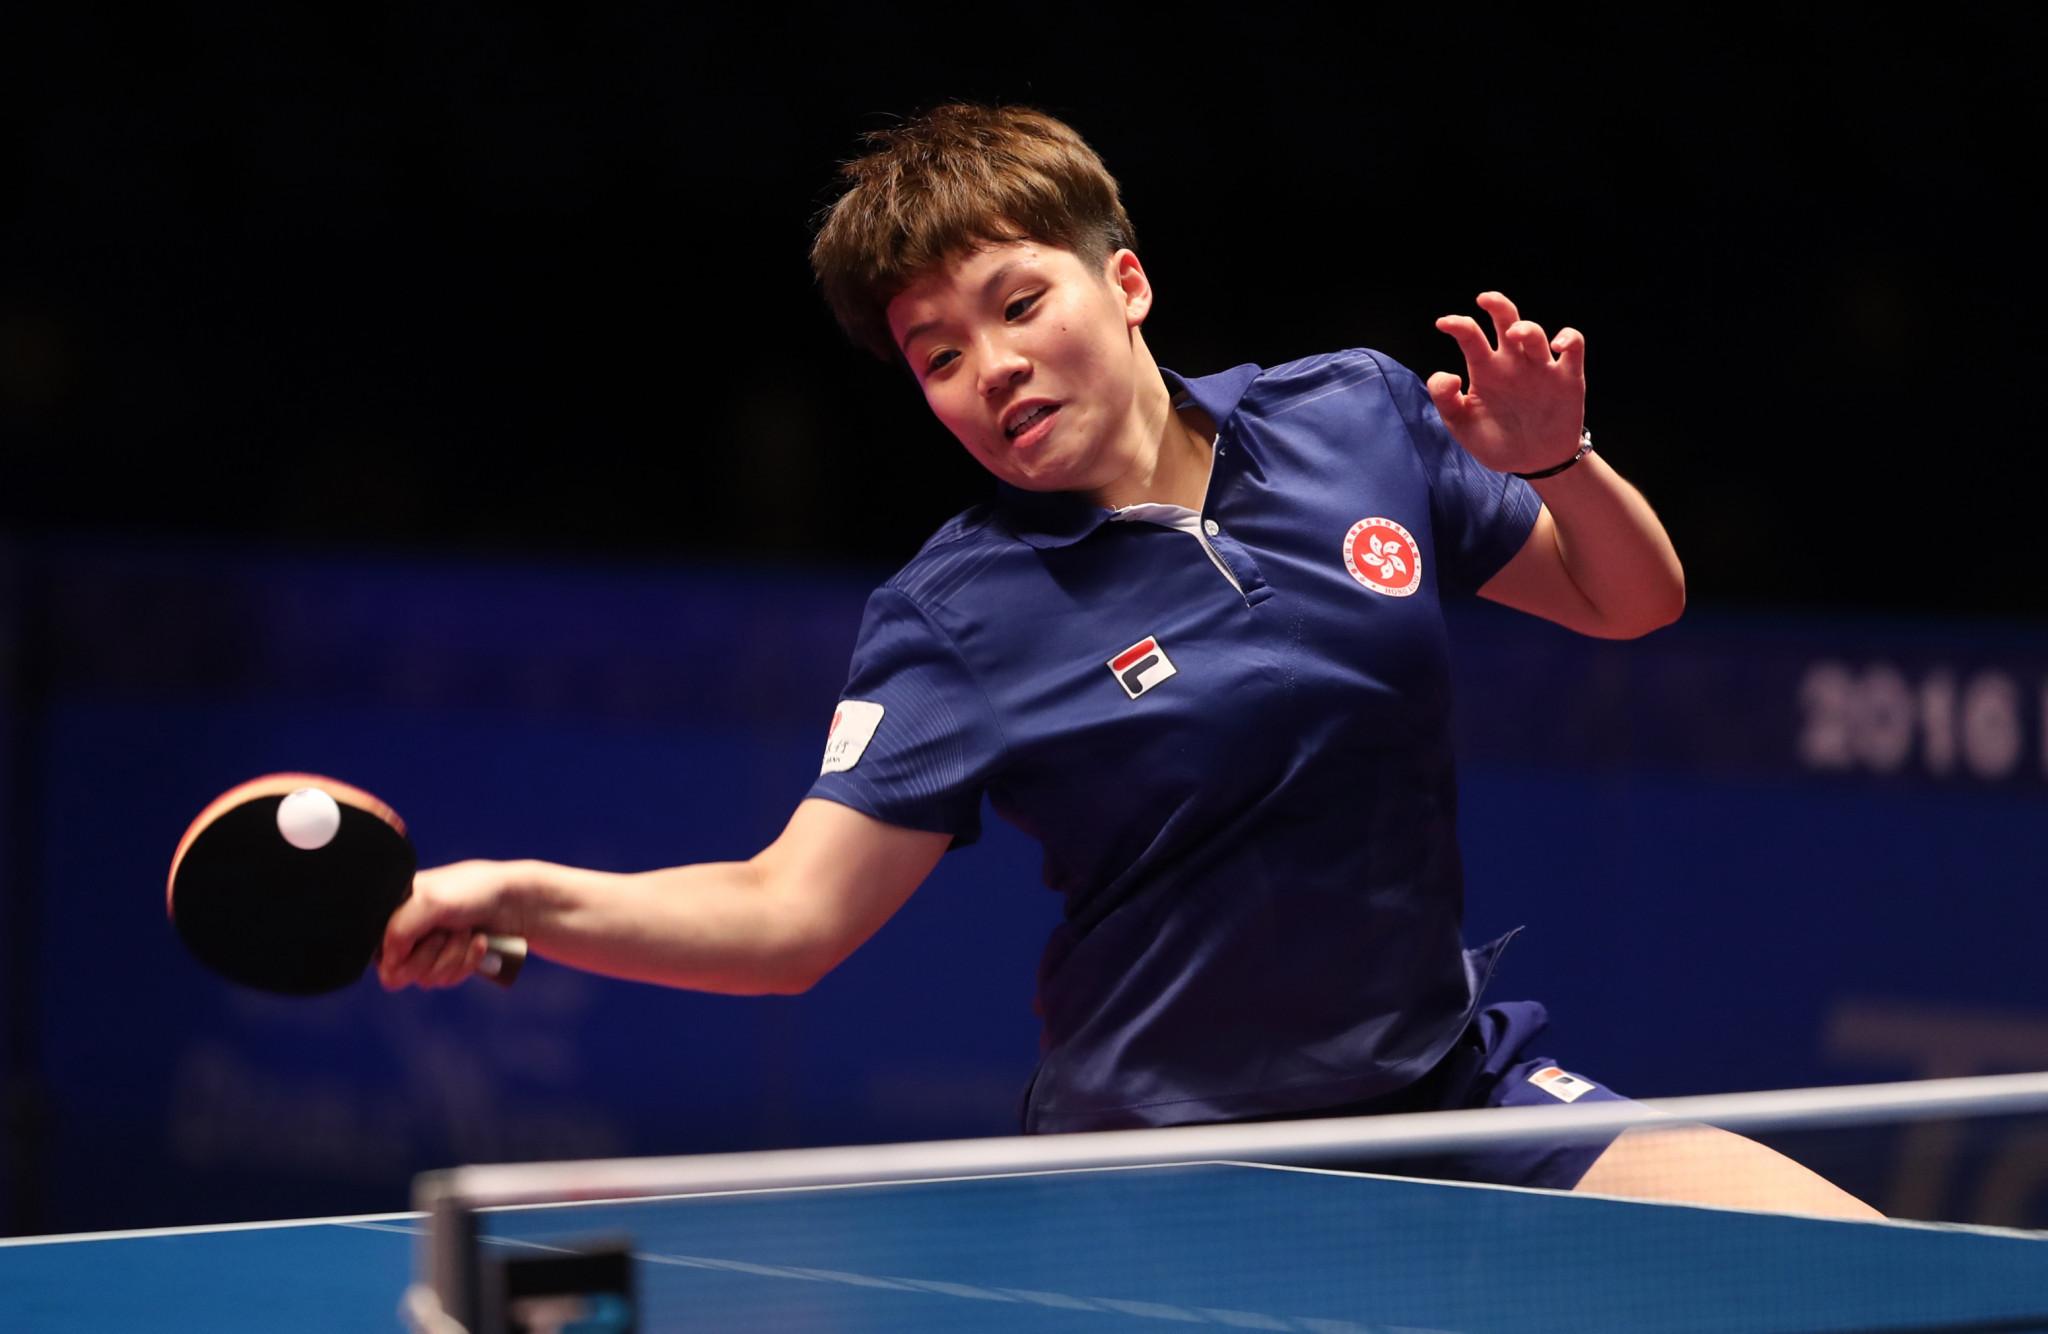 Nagasaki earns place in ITTF German Open main draw